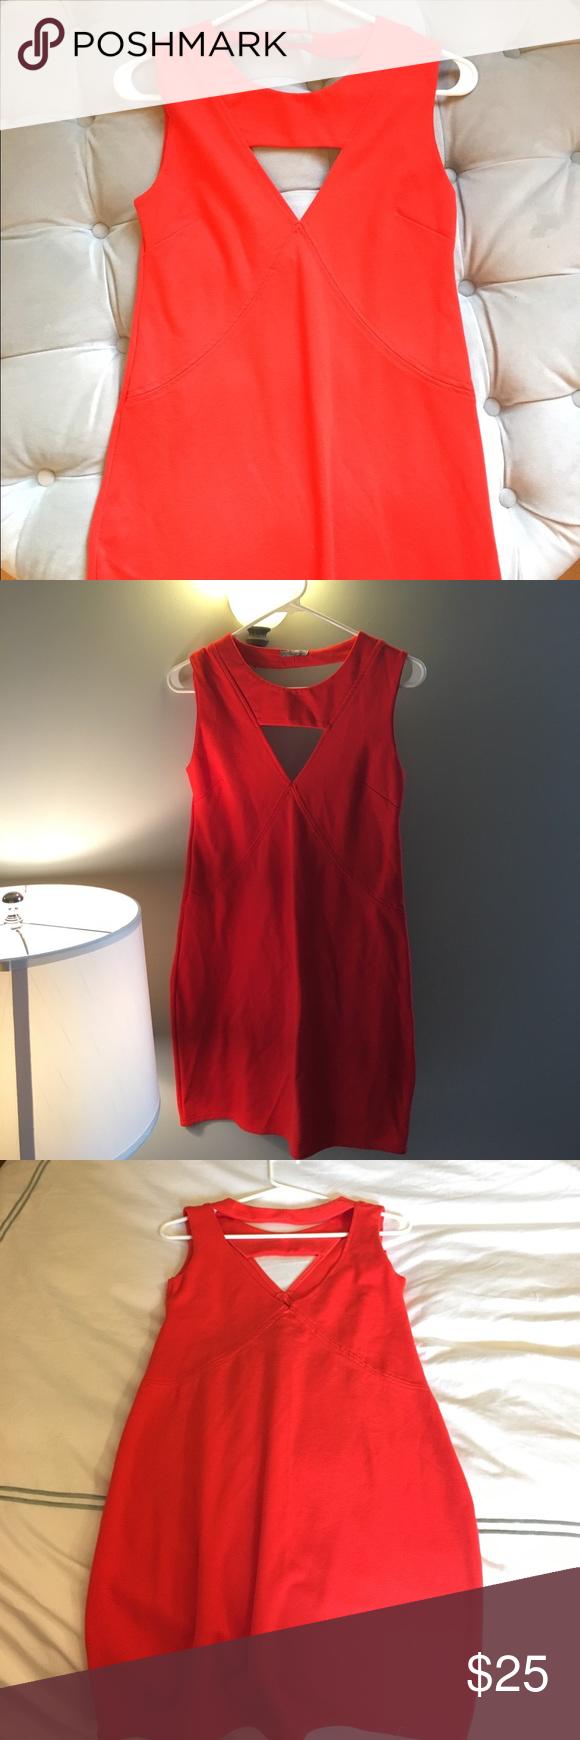 Zara collection red cut out dress euc pinterest